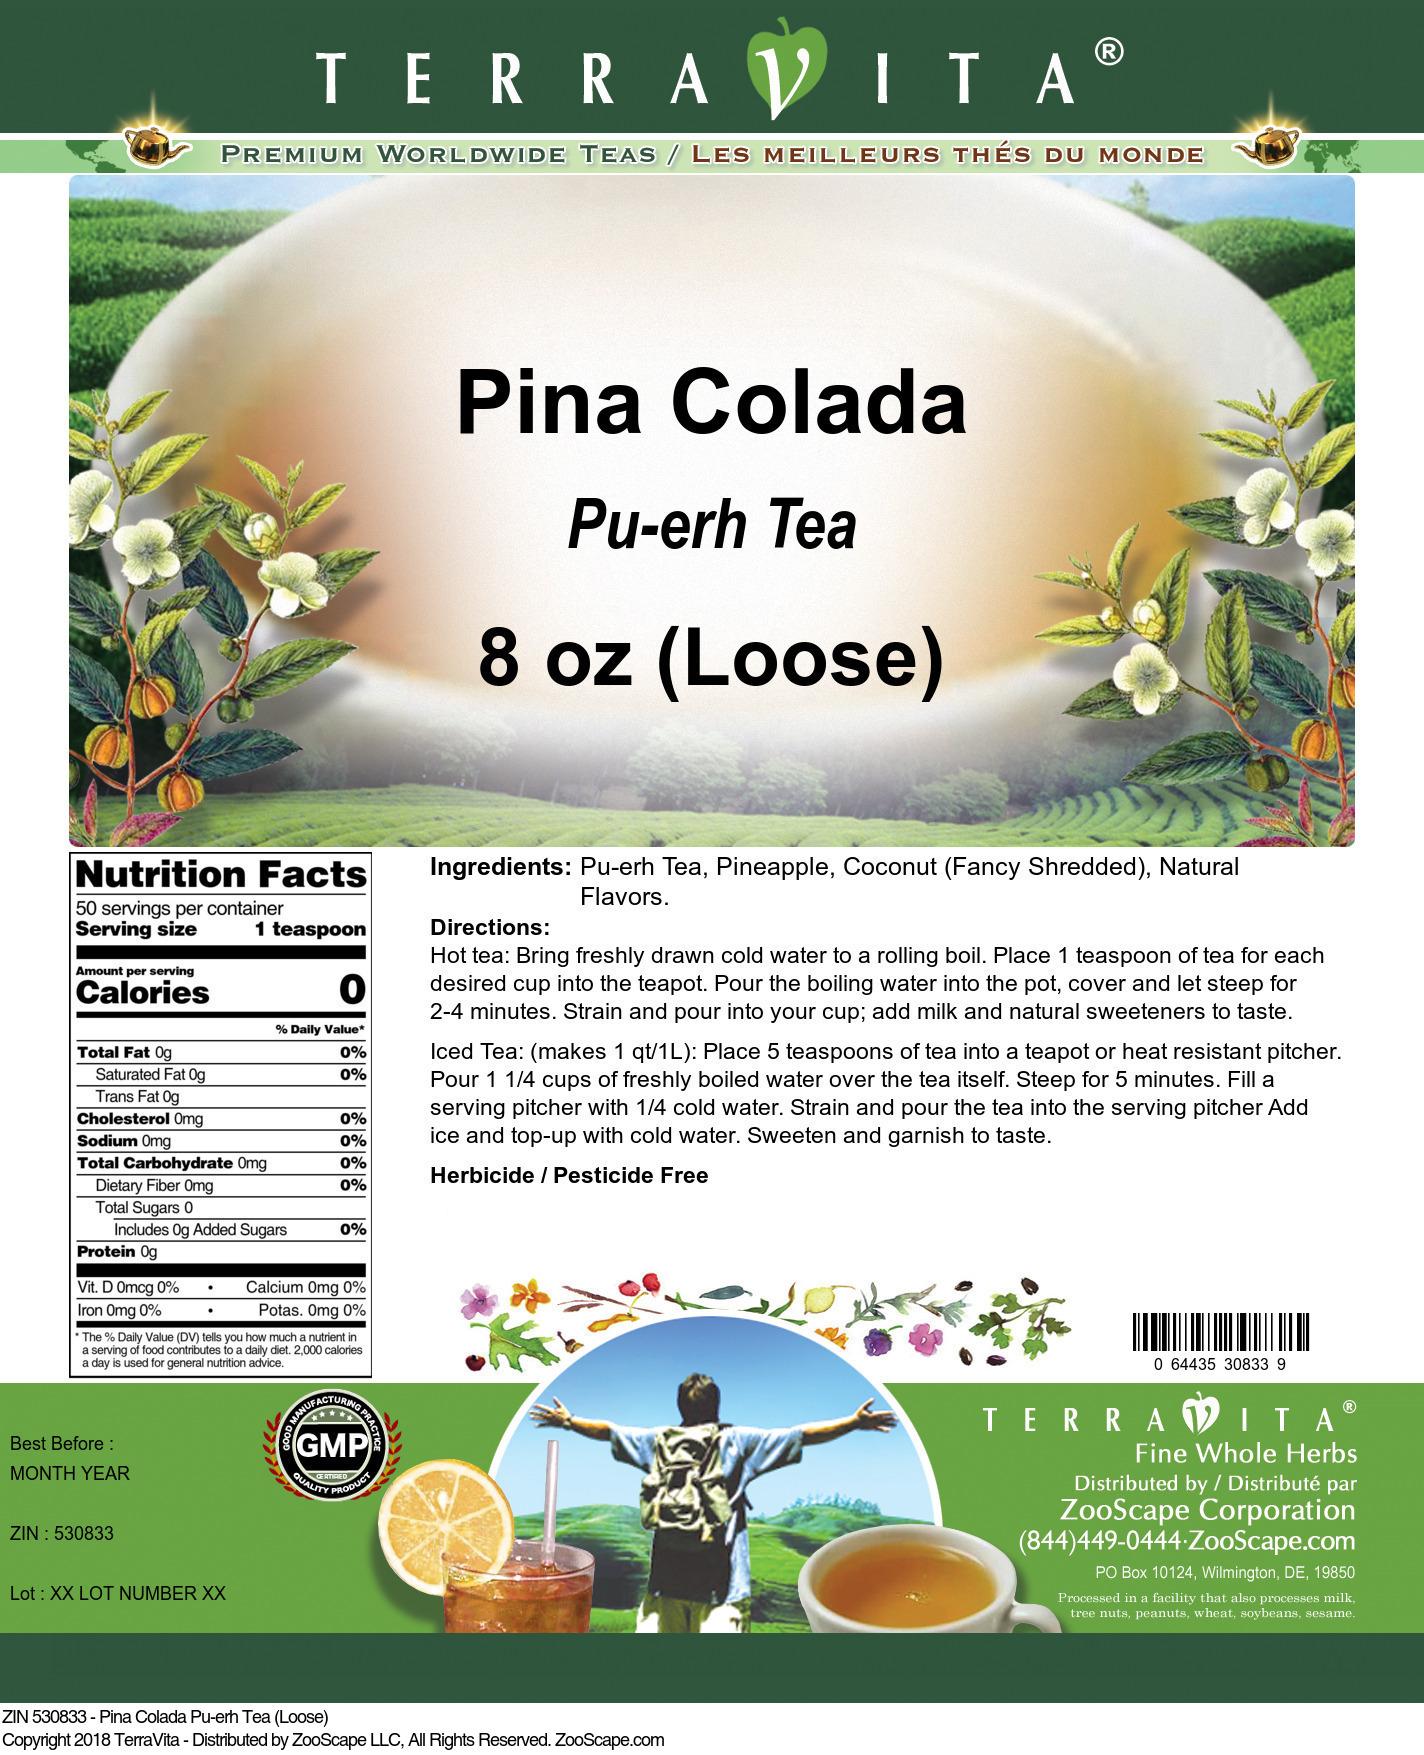 Pina Colada Pu-erh Tea